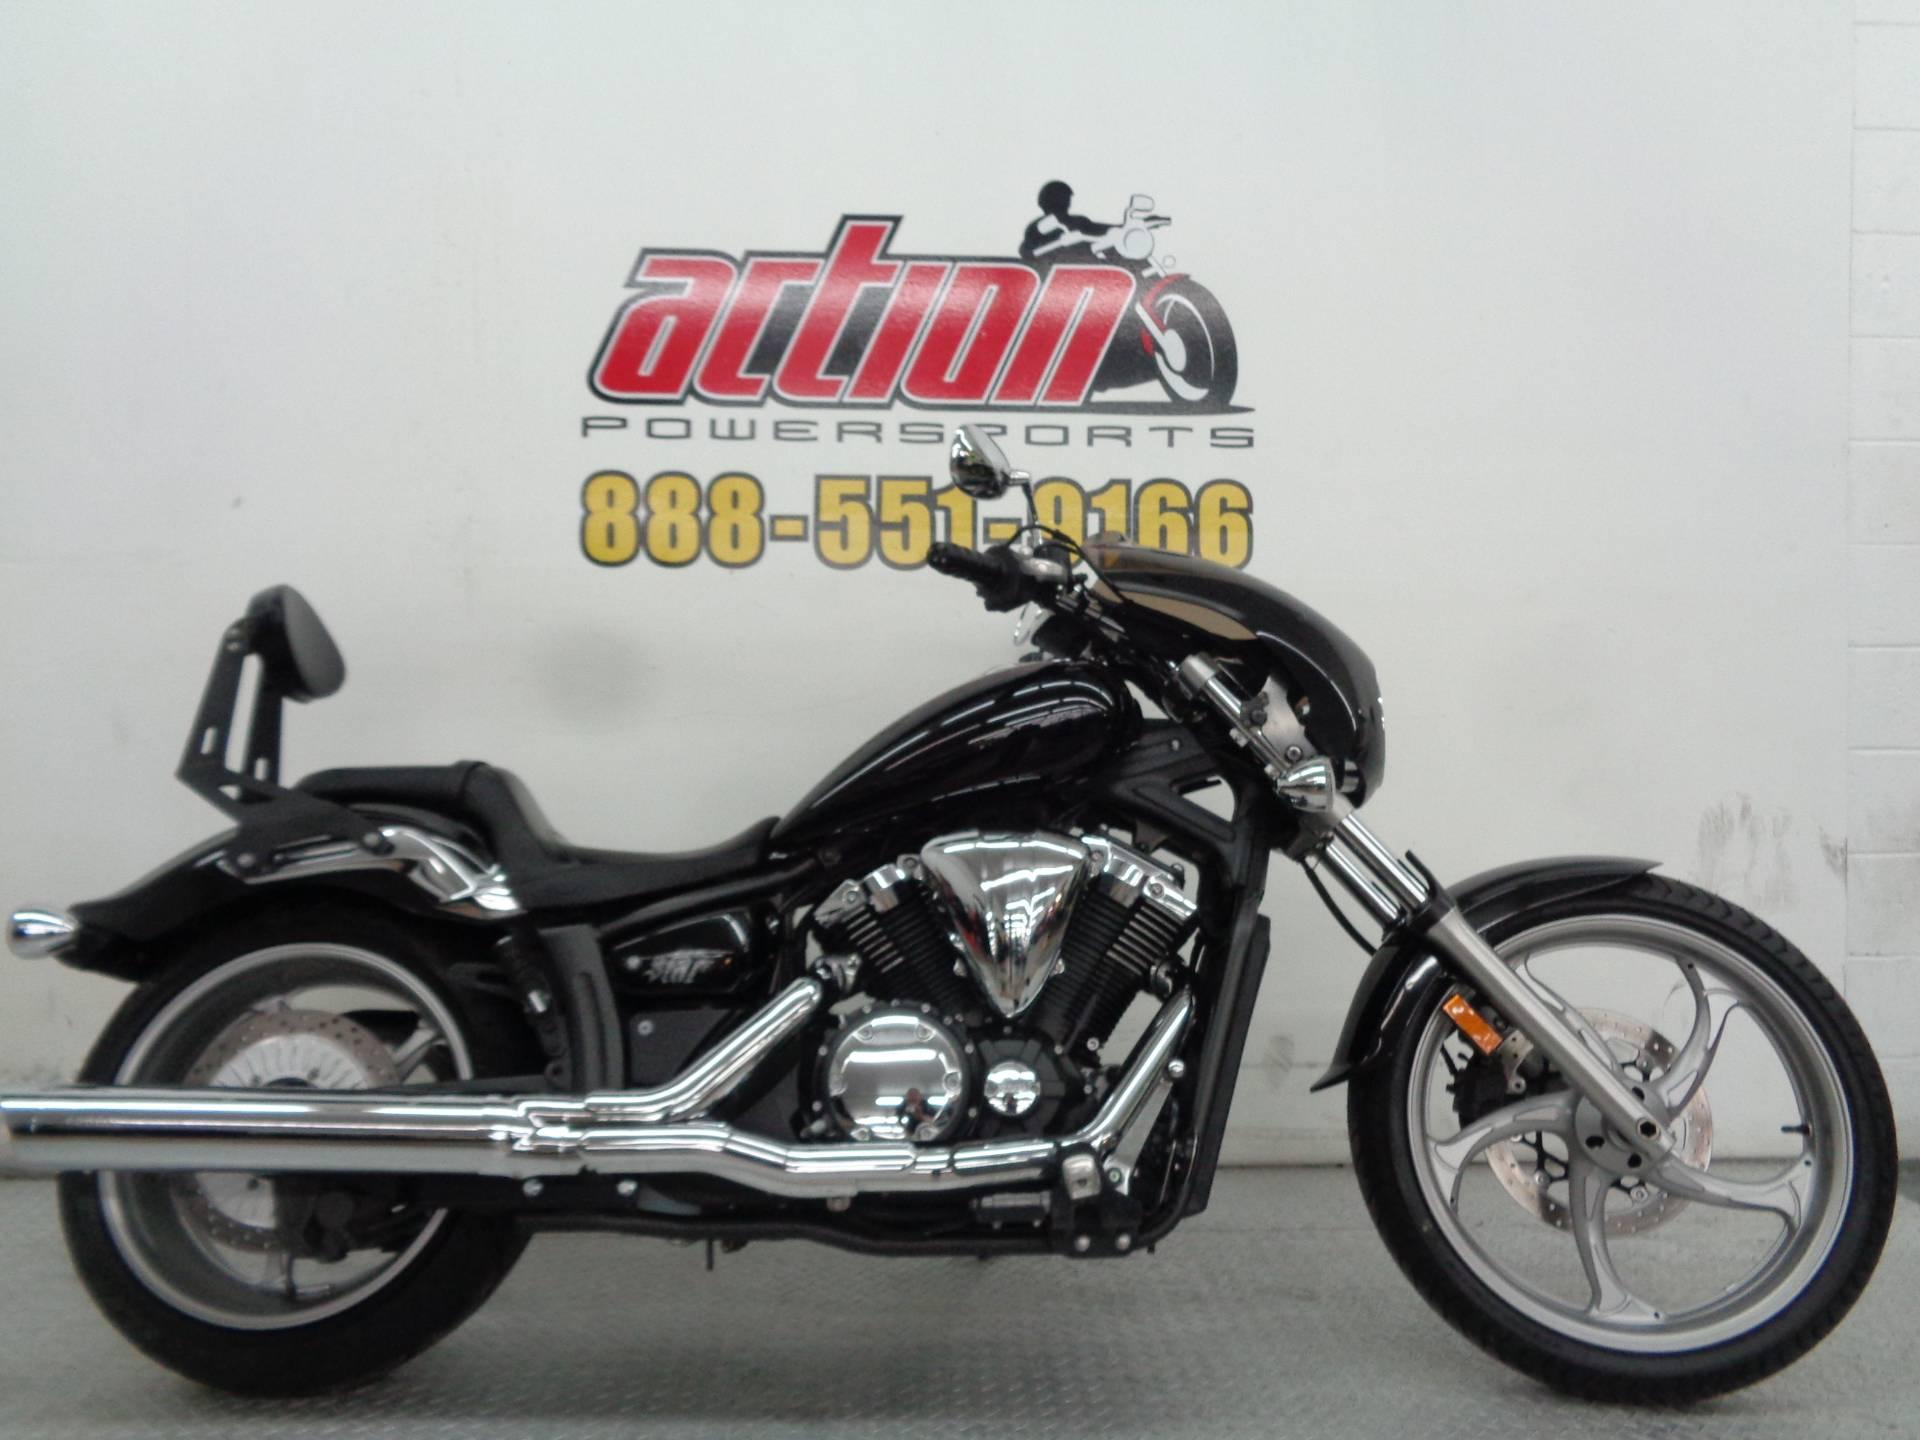 2012 Yamaha Stryker for sale 120574